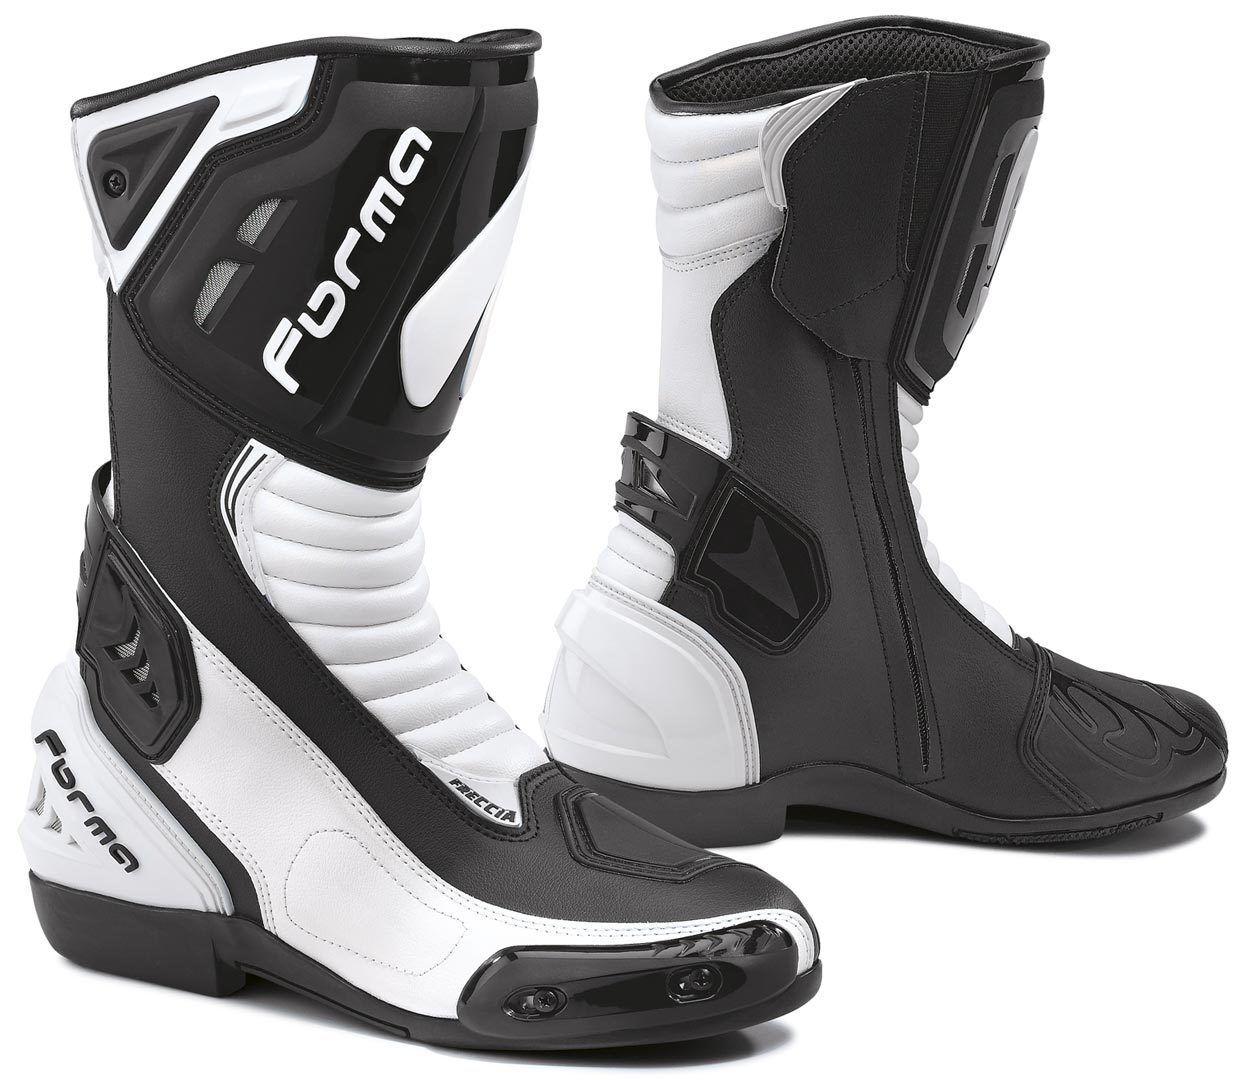 Forma Freccia Motorcycle Boots Black White 45